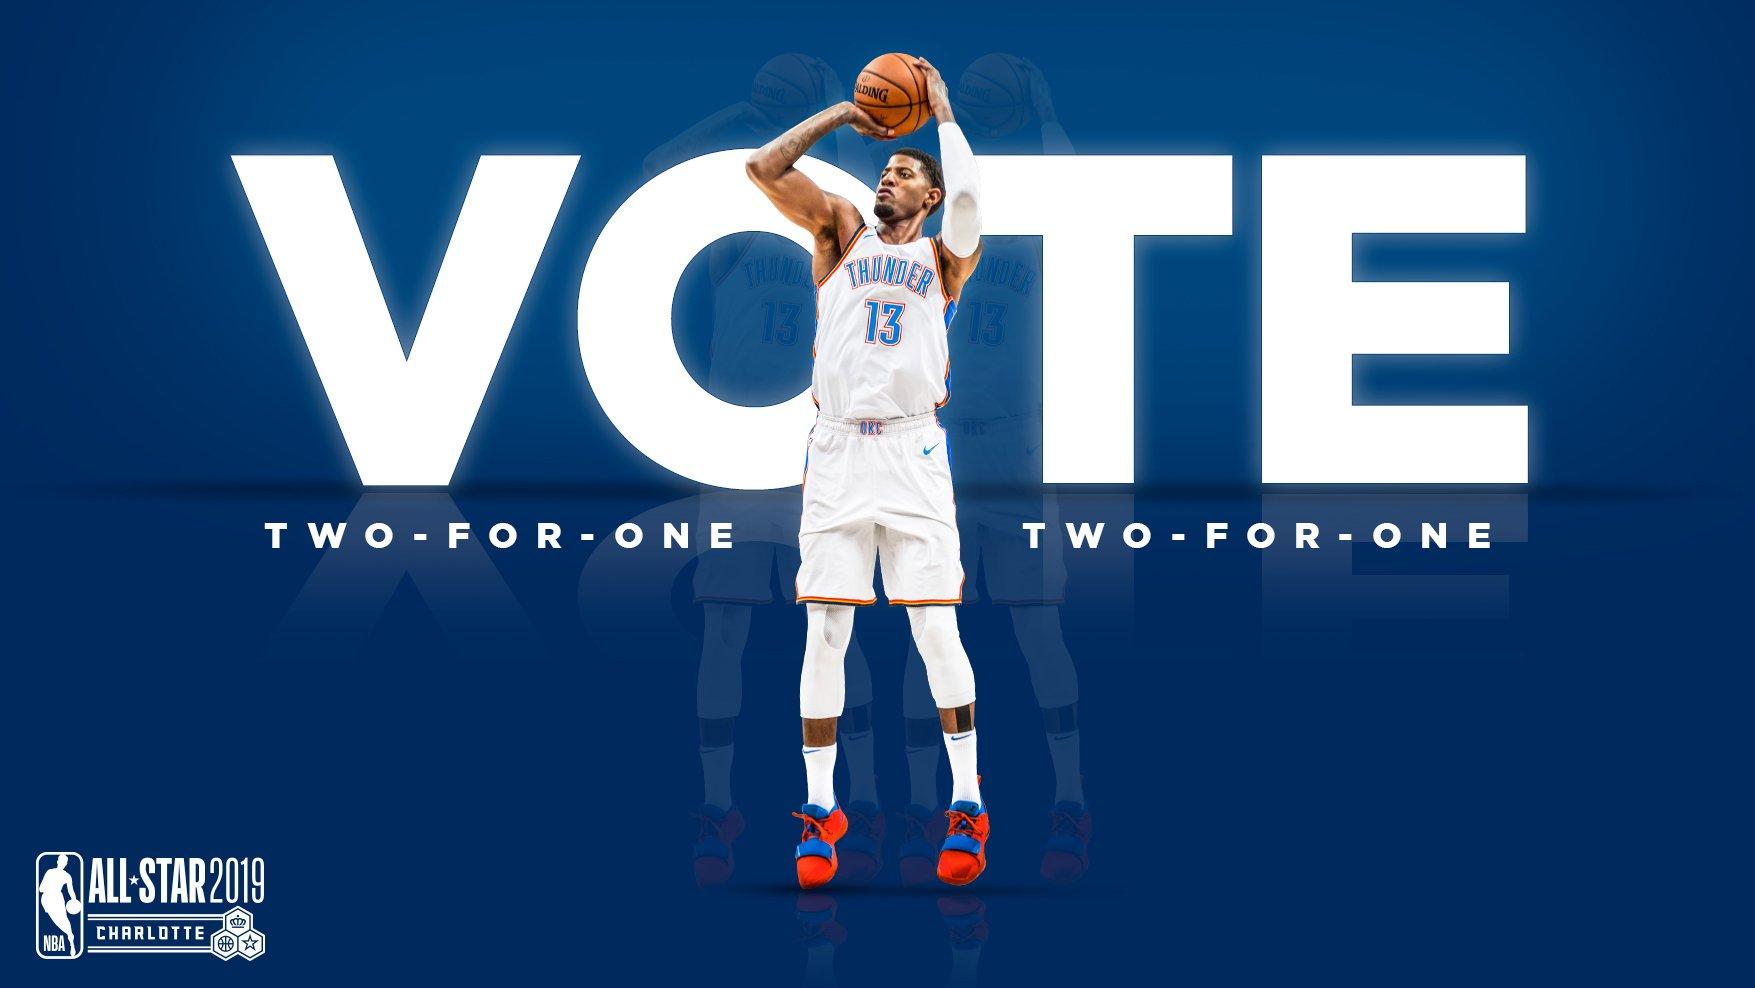 VOTE PAUL GEORGE NBA ALL-STAR  ⭐️: https://t.co/zRCS00RkF6   ⭐️: https://t.co/Kx43zI4pnJ https://t.co/5X9K0ayHcc